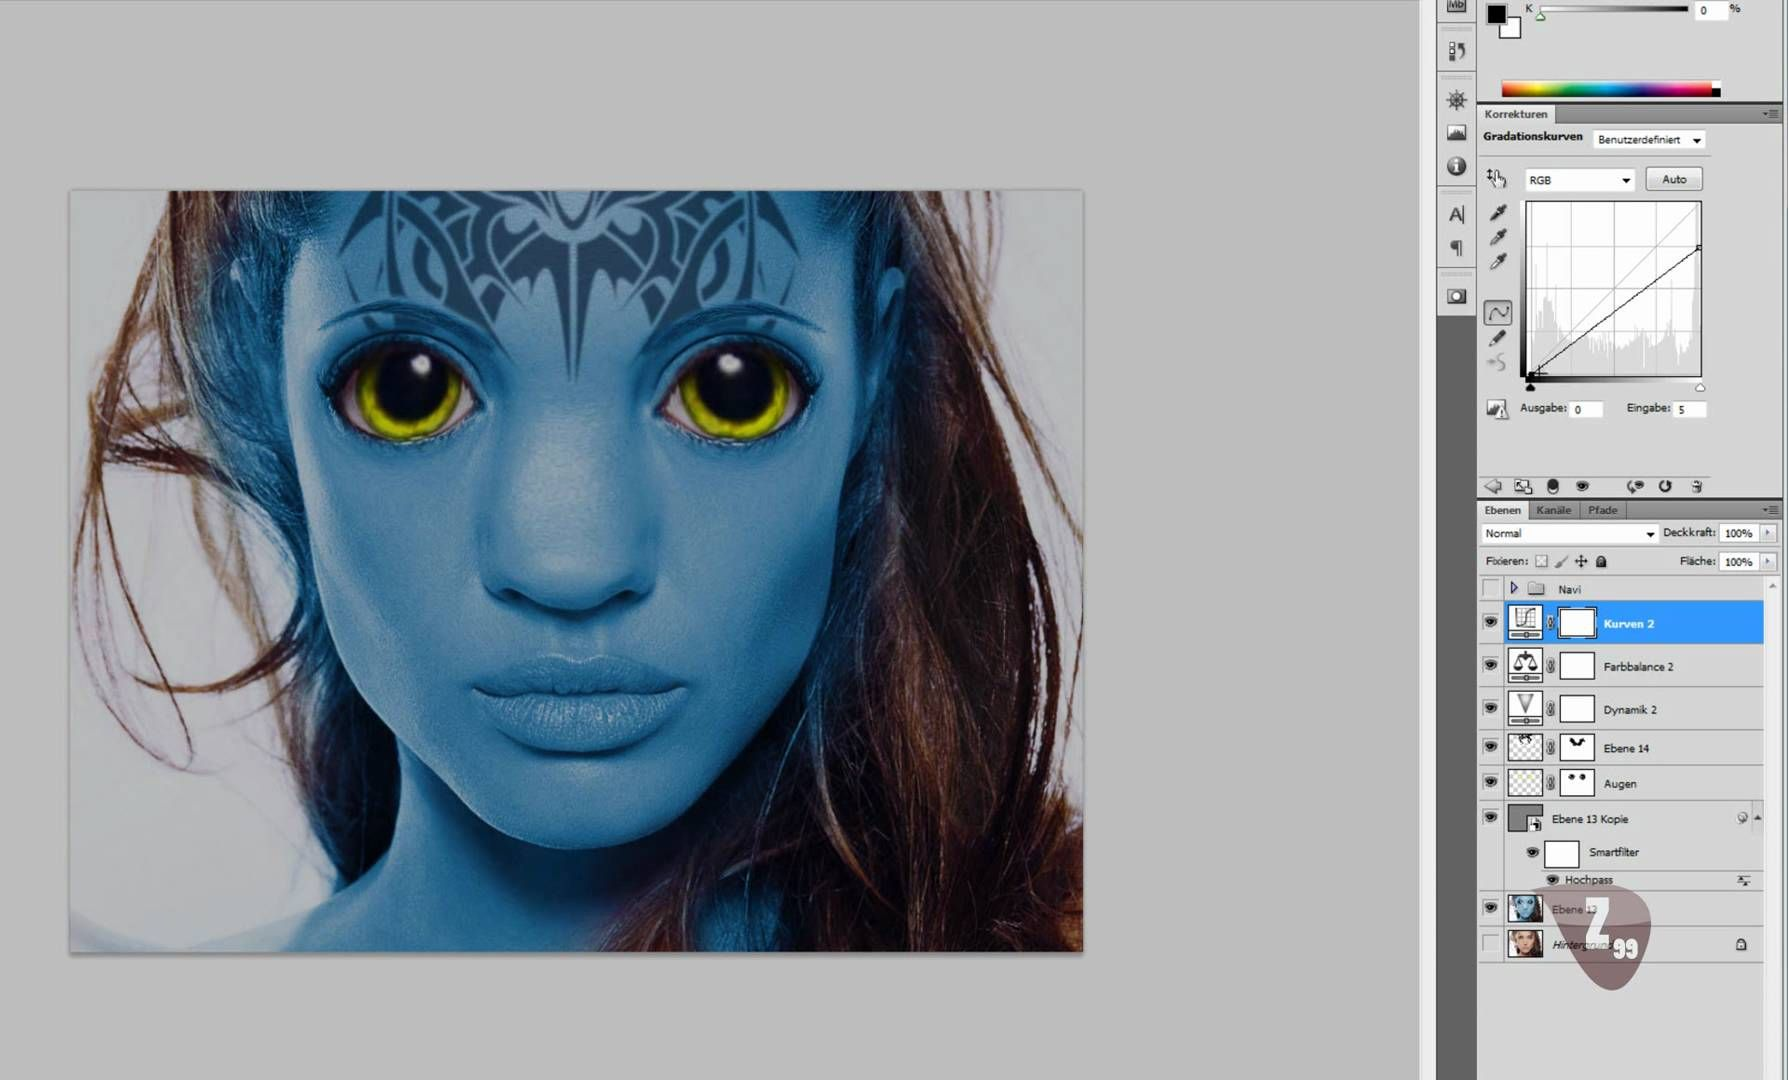 Navi avatar erstellen teil 34 photoshop tutorial avatar navi avatar erstellen teil 34 photoshop tutorial baditri Images